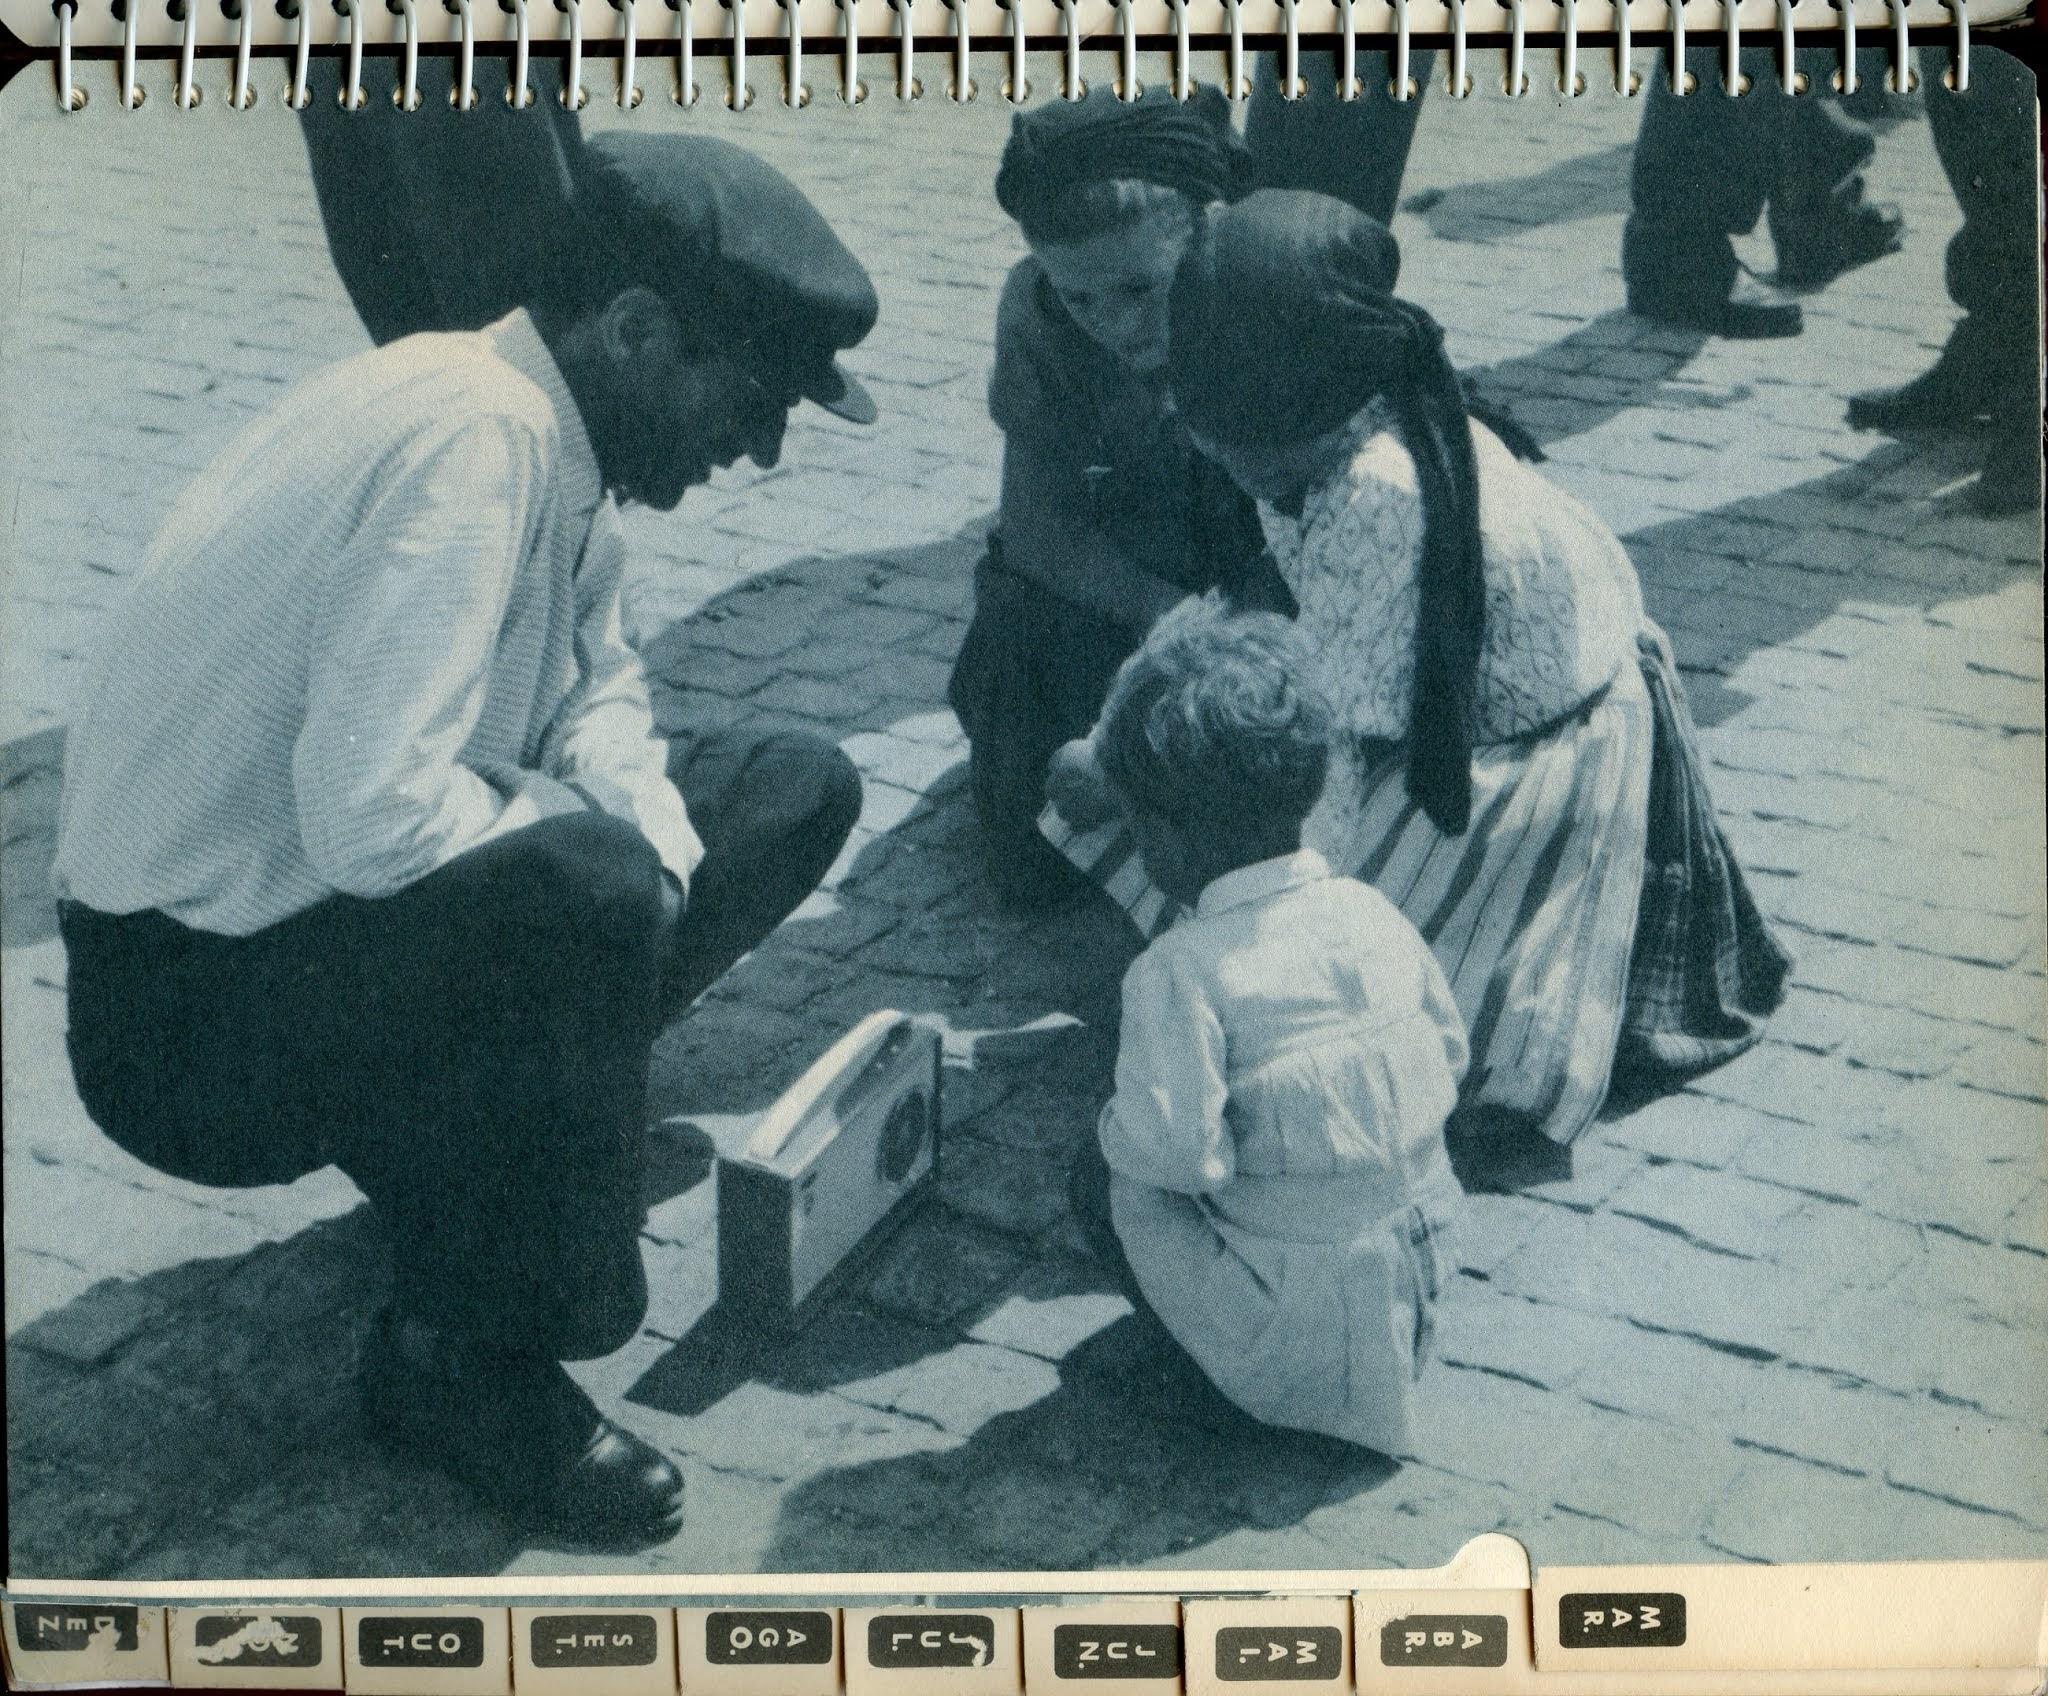 1961 agenda philips 1 (1)